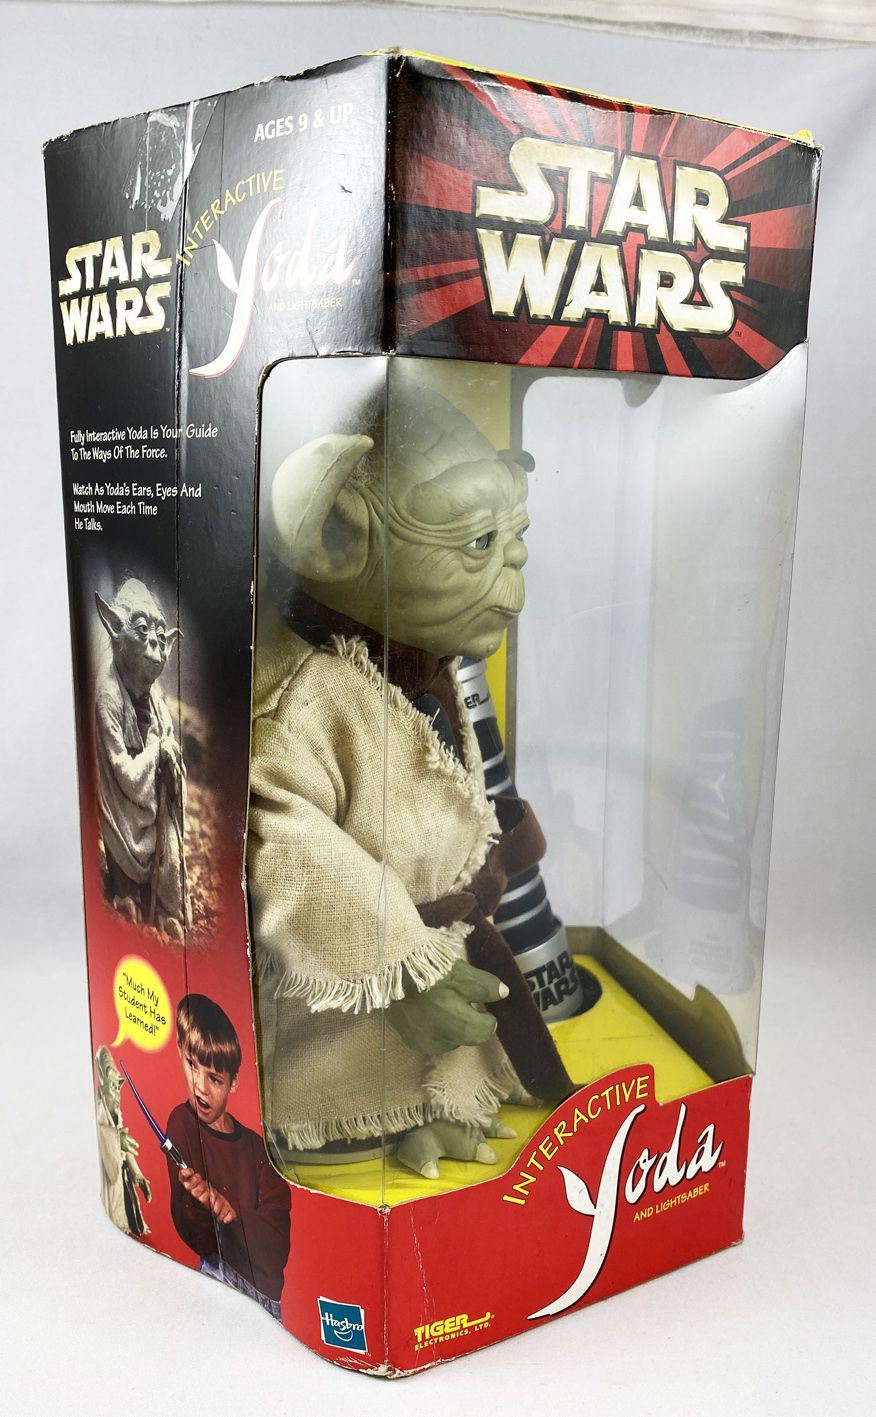 Star Wars Episode 1 - Hasbro/Tiger Electronics - Interactive Yoda and Lightsaber